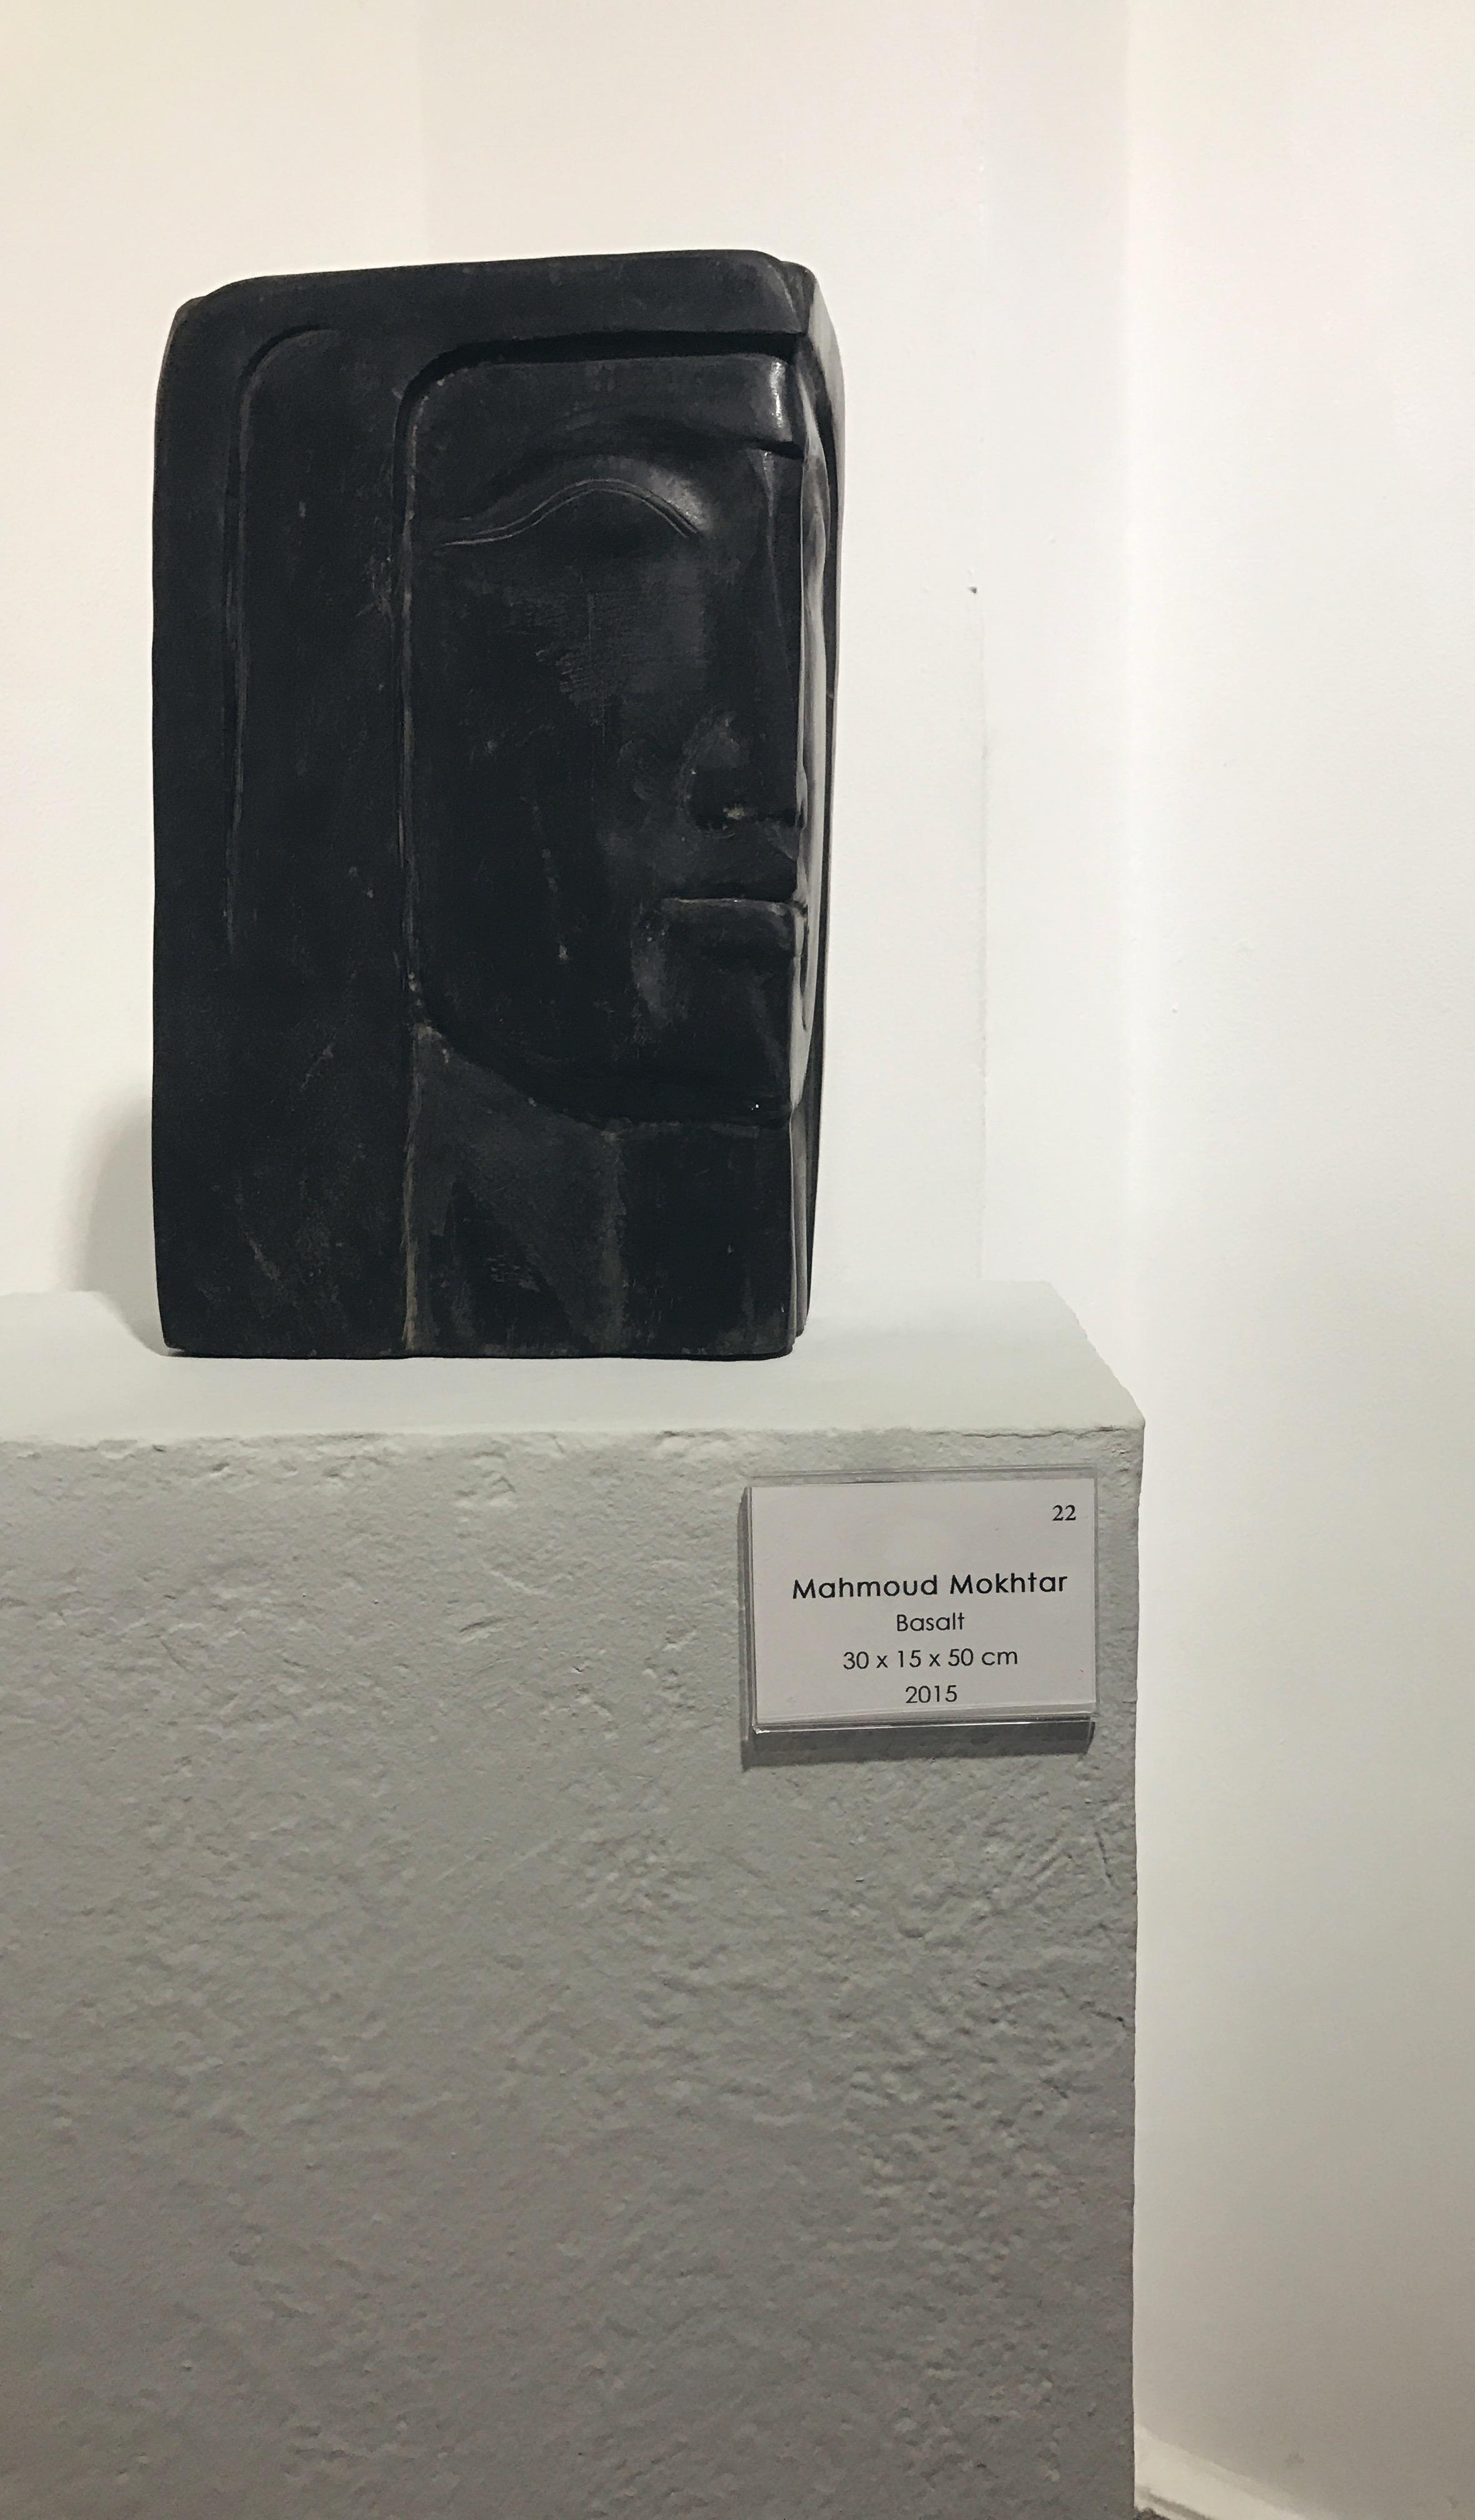 Mahmoud Mokhtar   30 x 15 x 50 cm  2015